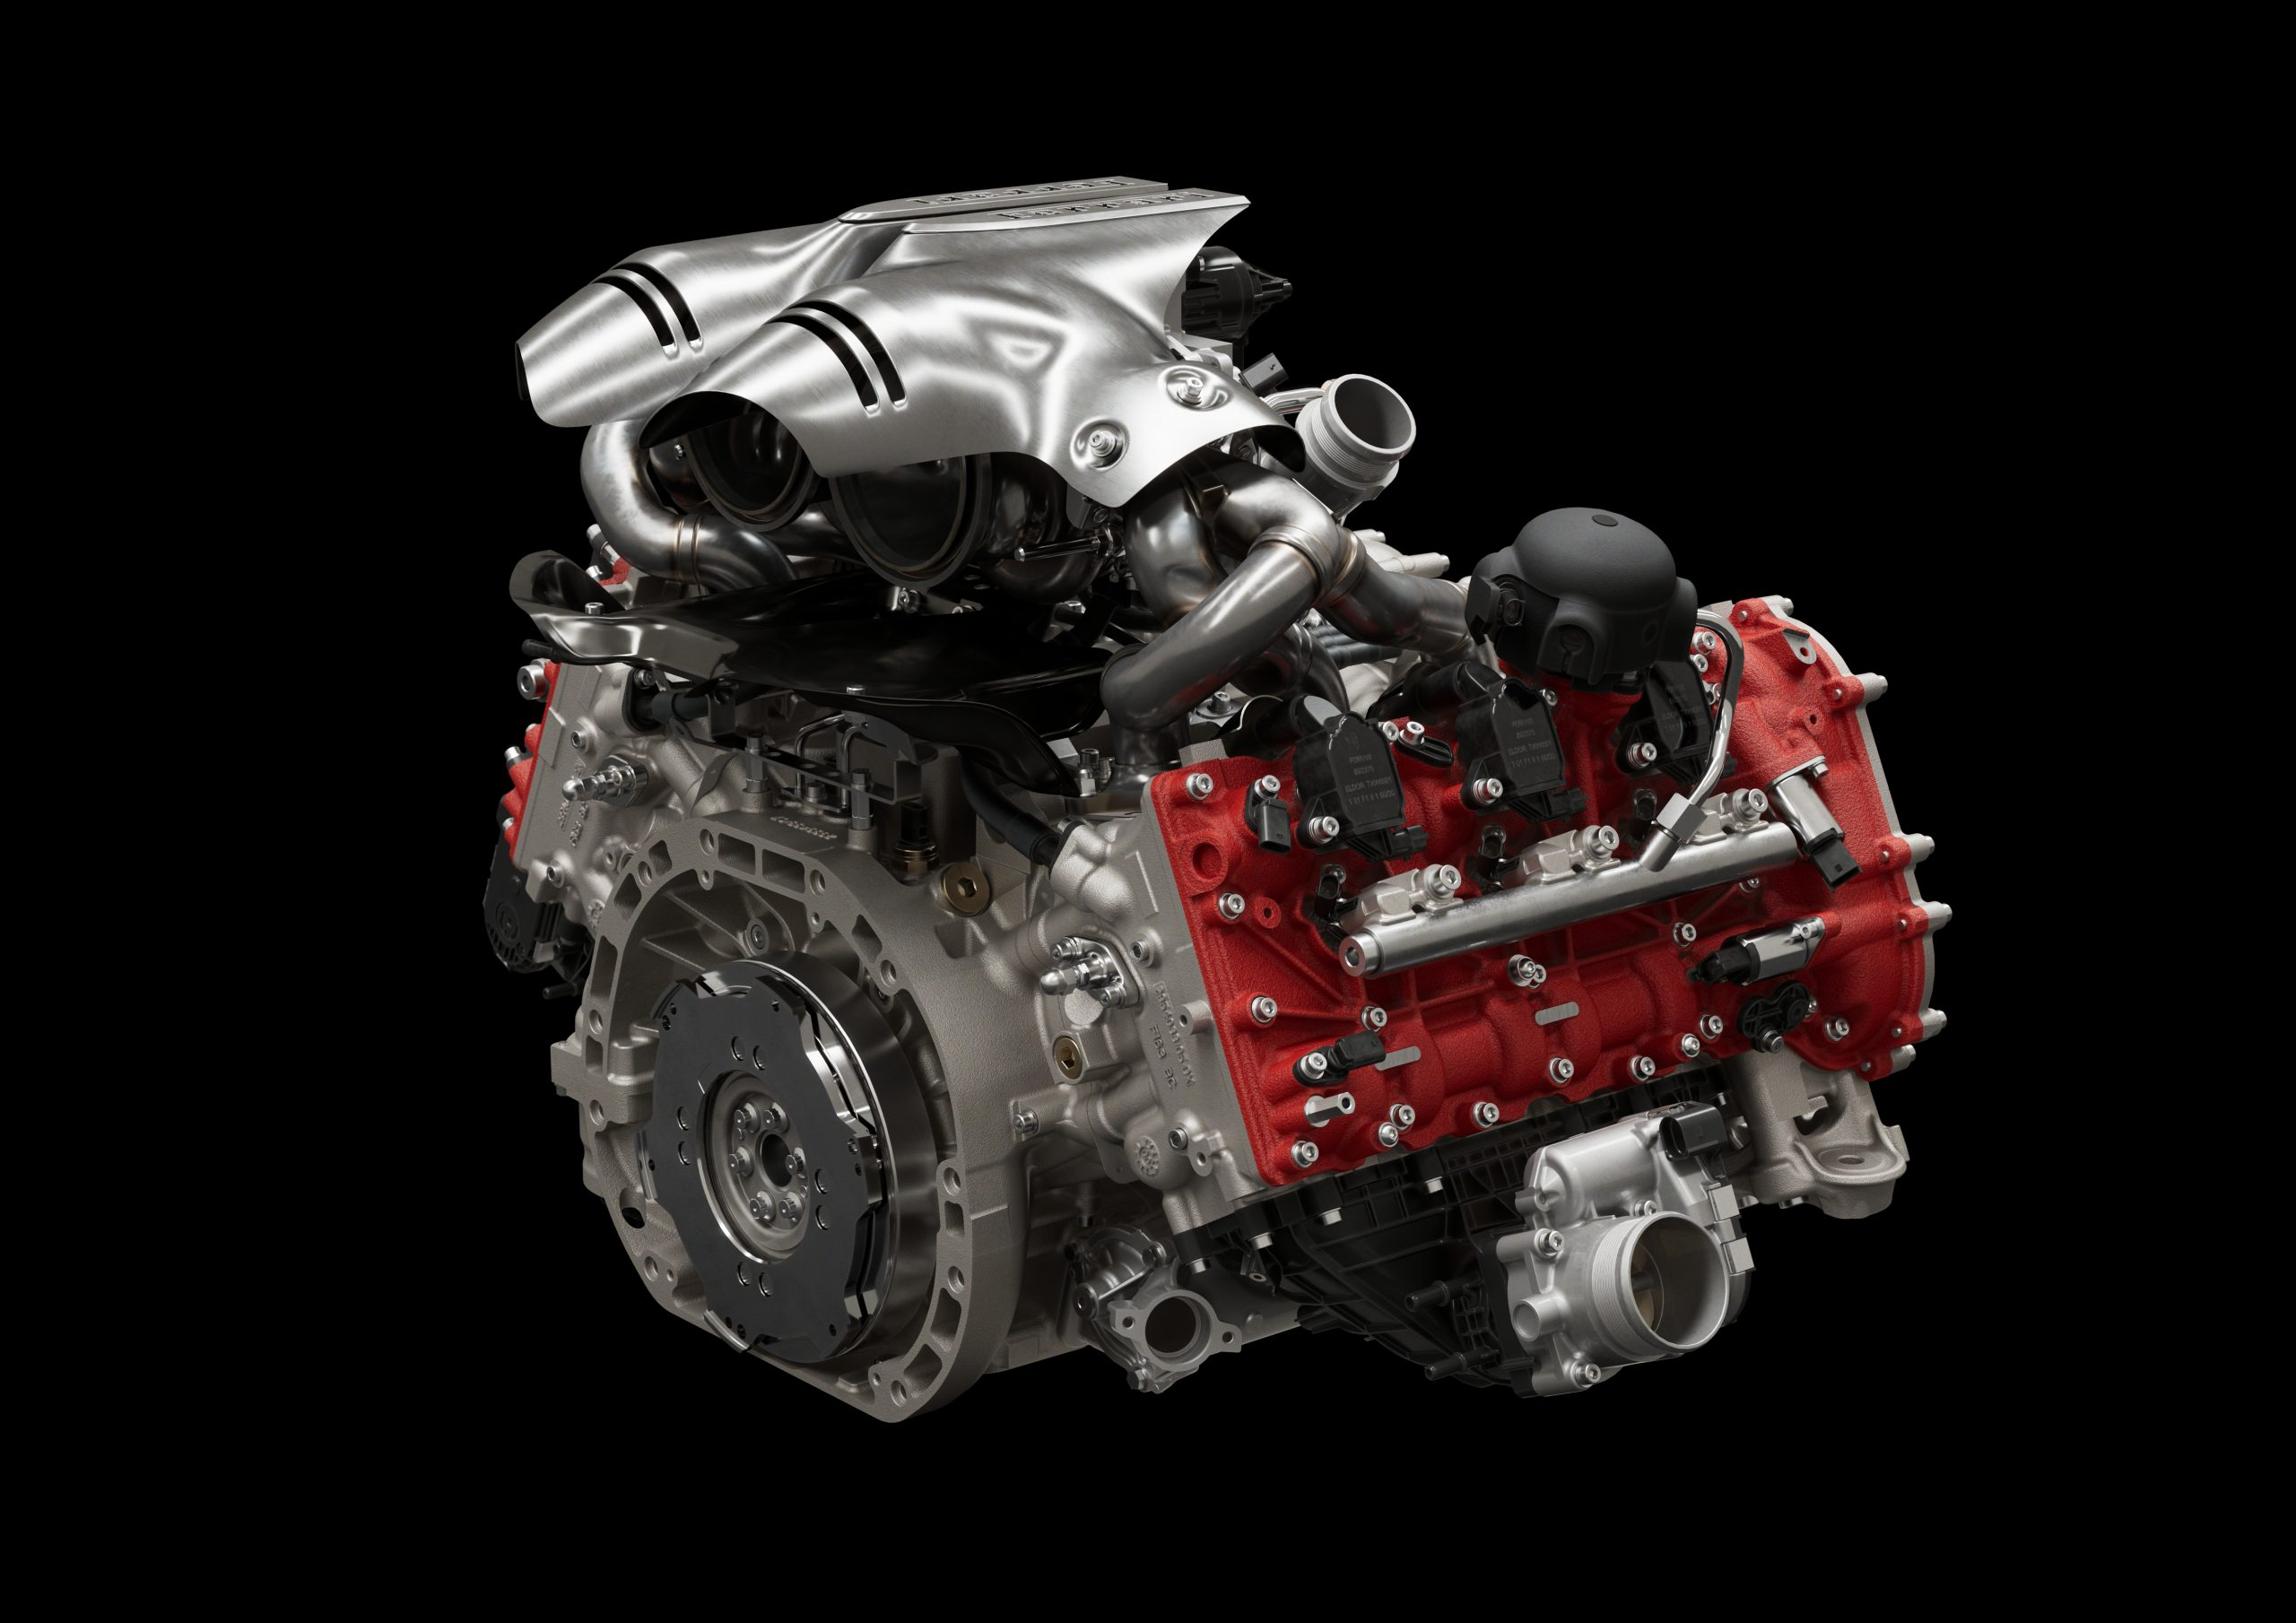 02 296 GTB Engine 34 scaled Αυτή είναι η νέα Ferrari 296GTB 296GTB, Ferrari, Ferrari 296GTB, supercar, supercars, zblog, ειδήσεις, Νέα